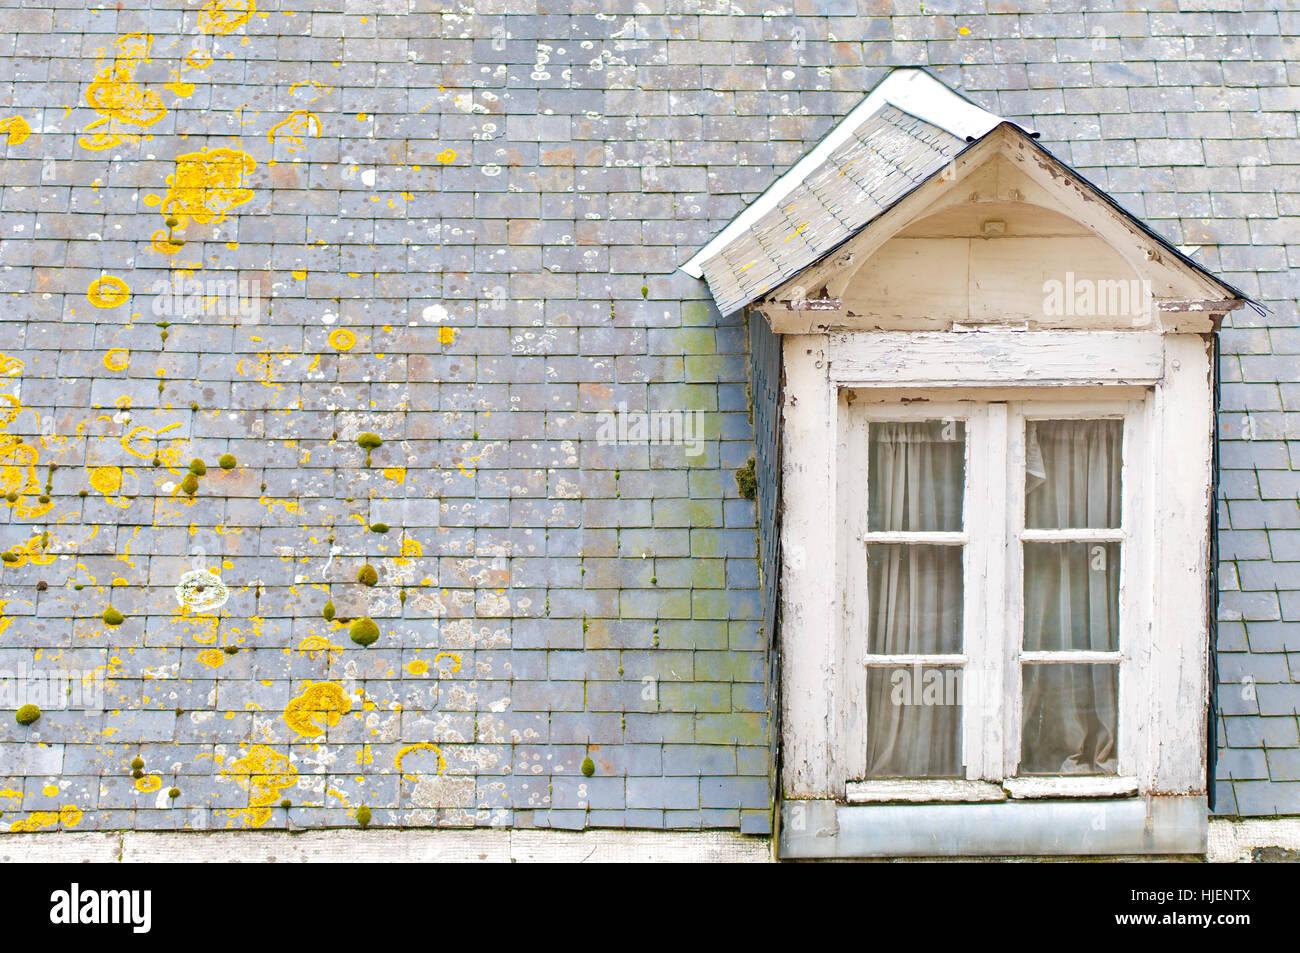 Haus Gebaude Detail Fenster Bullauge Dachfenster Fenster Holz